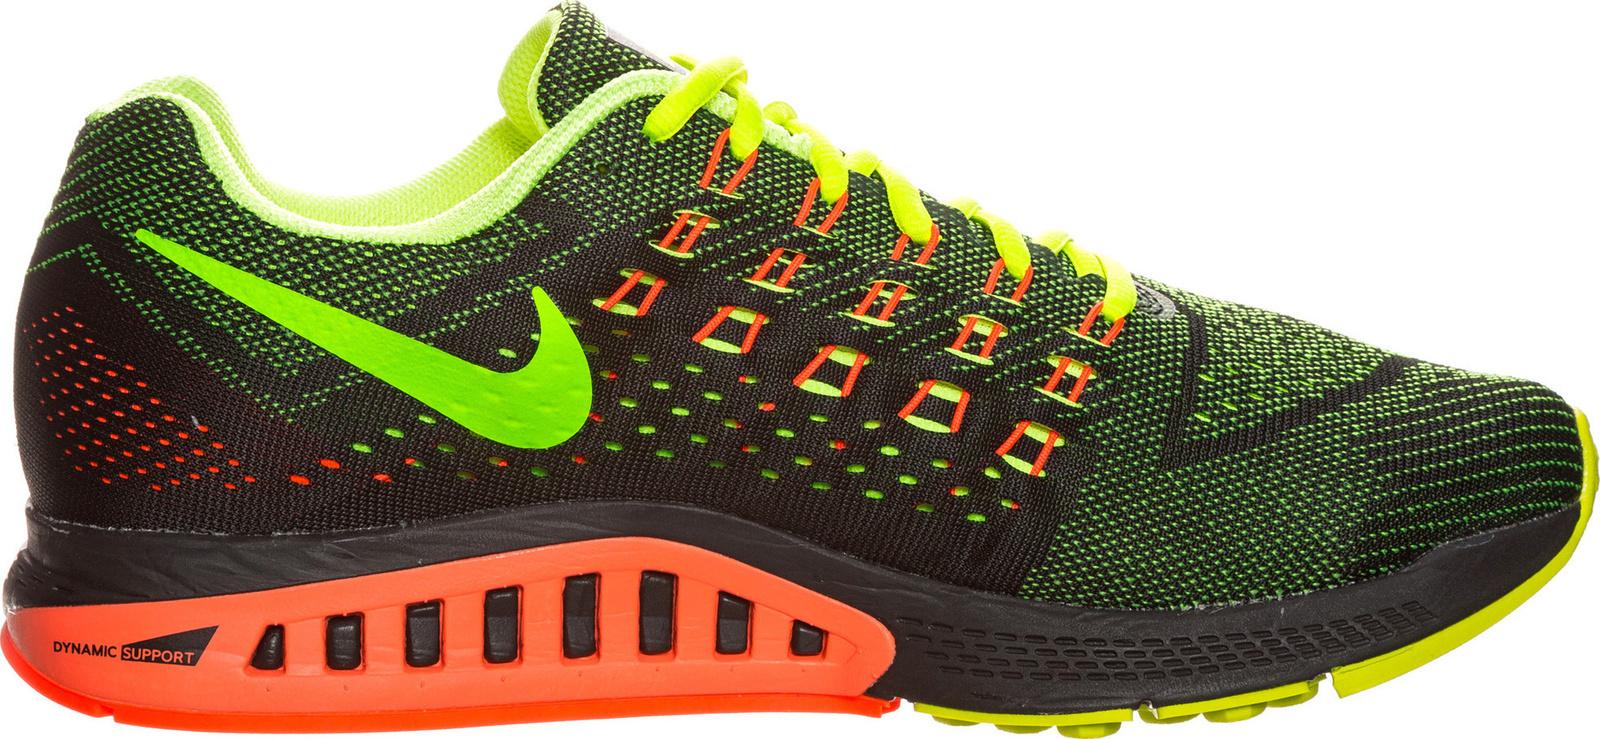 best cheap 27556 e38ac Nike Air Zoom Structure 18 683731-700 - Skroutz.gr